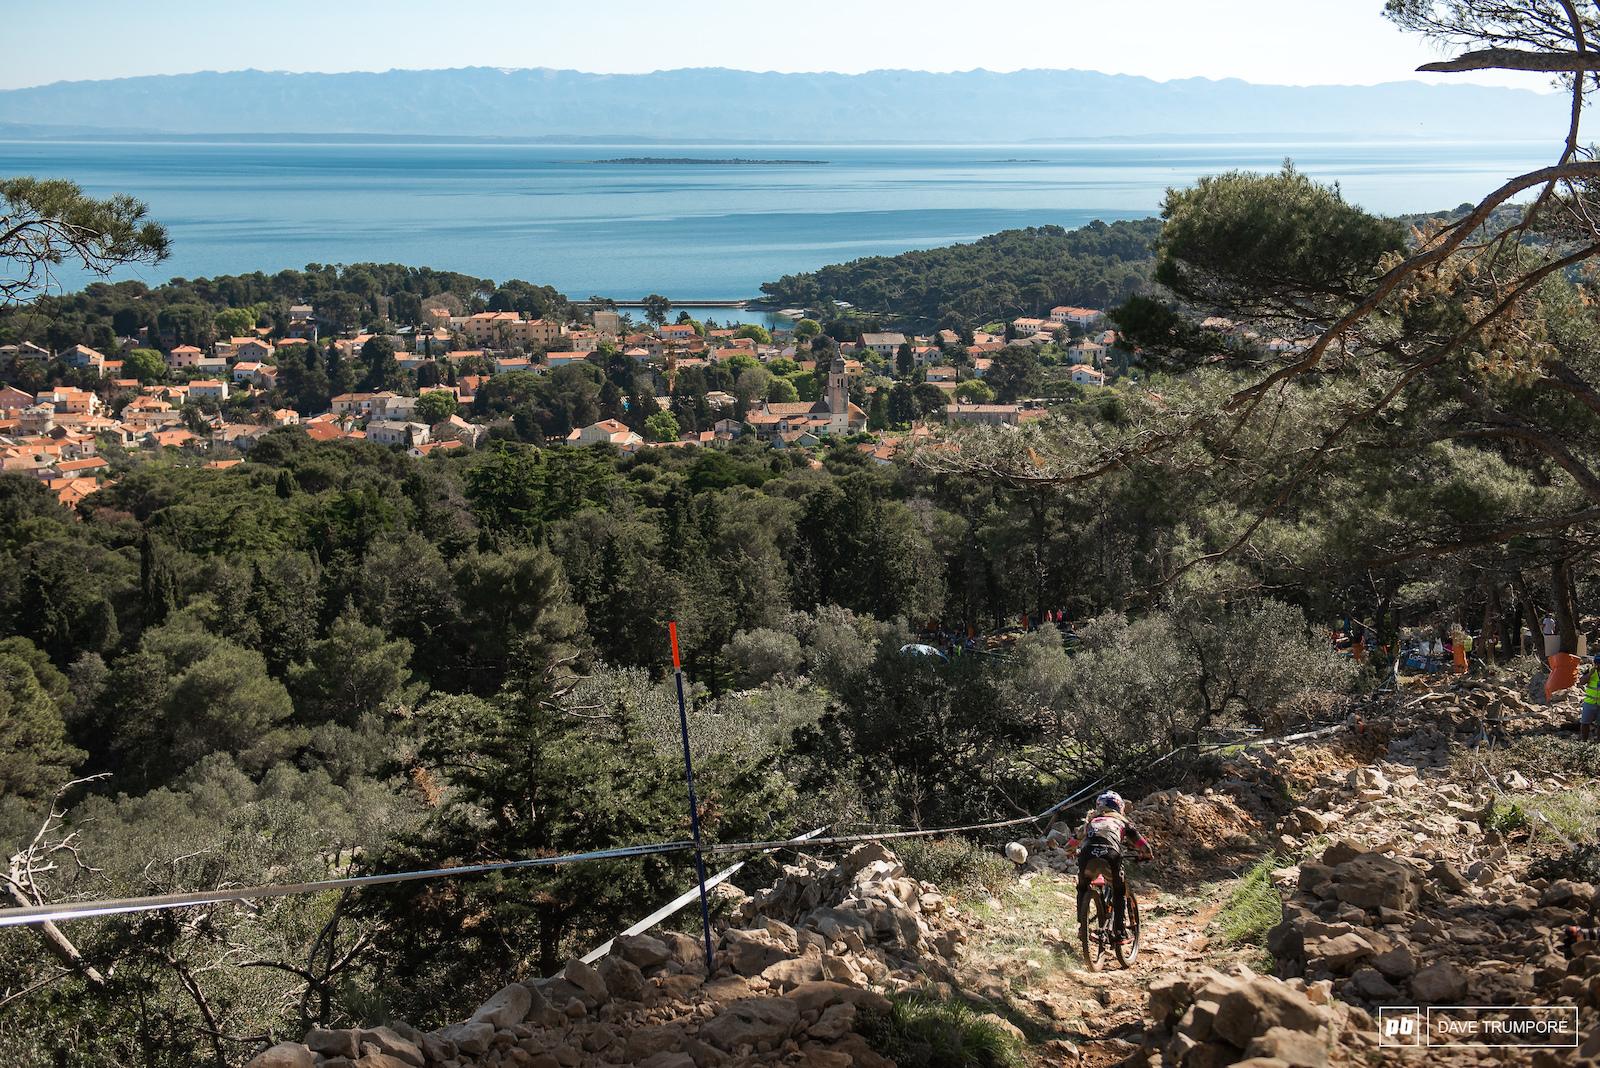 beautiful views of the Adriatic Sea